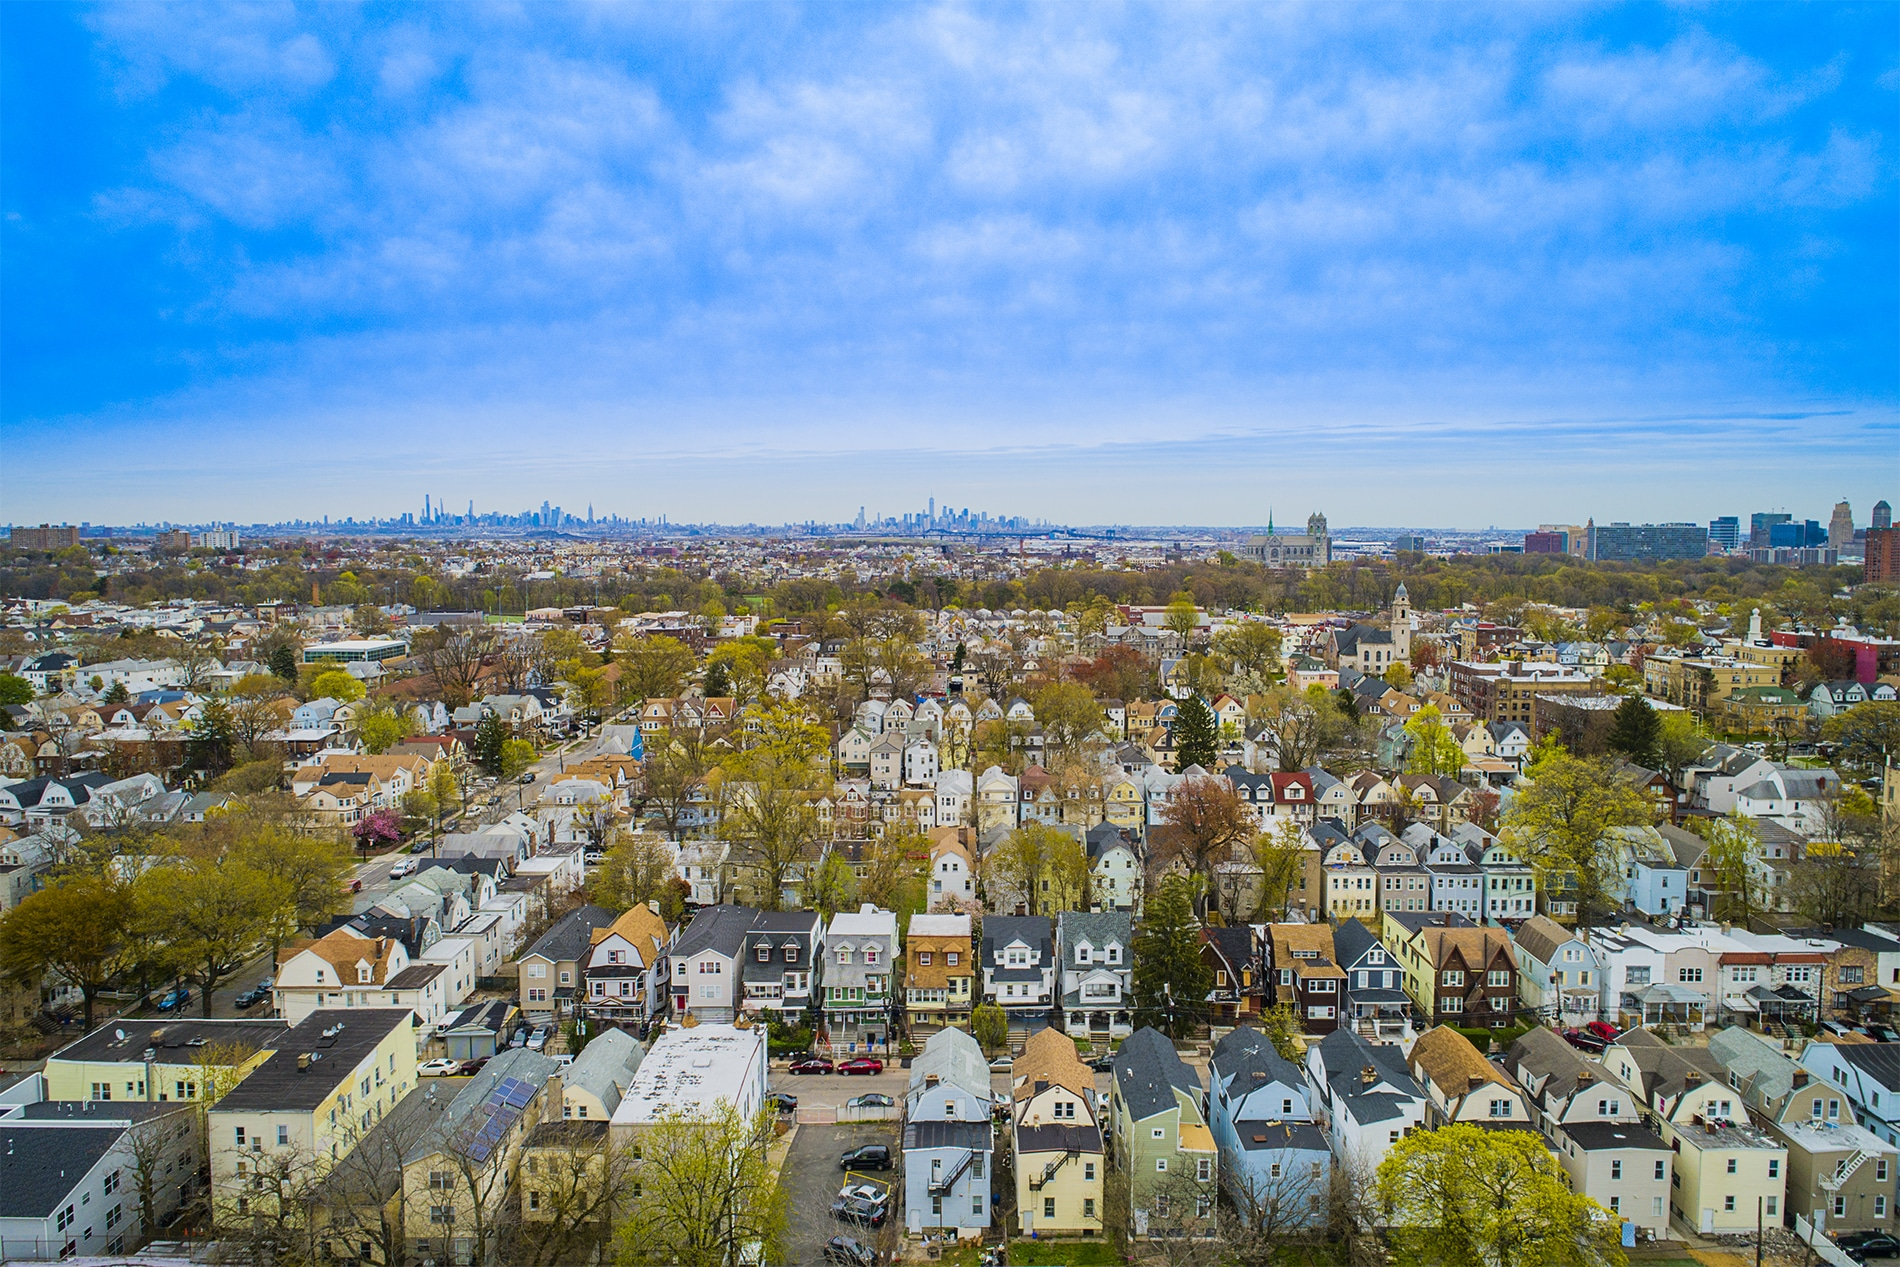 Drone Photograph taken of a neighborhood in North Newark in Newark New Jersey